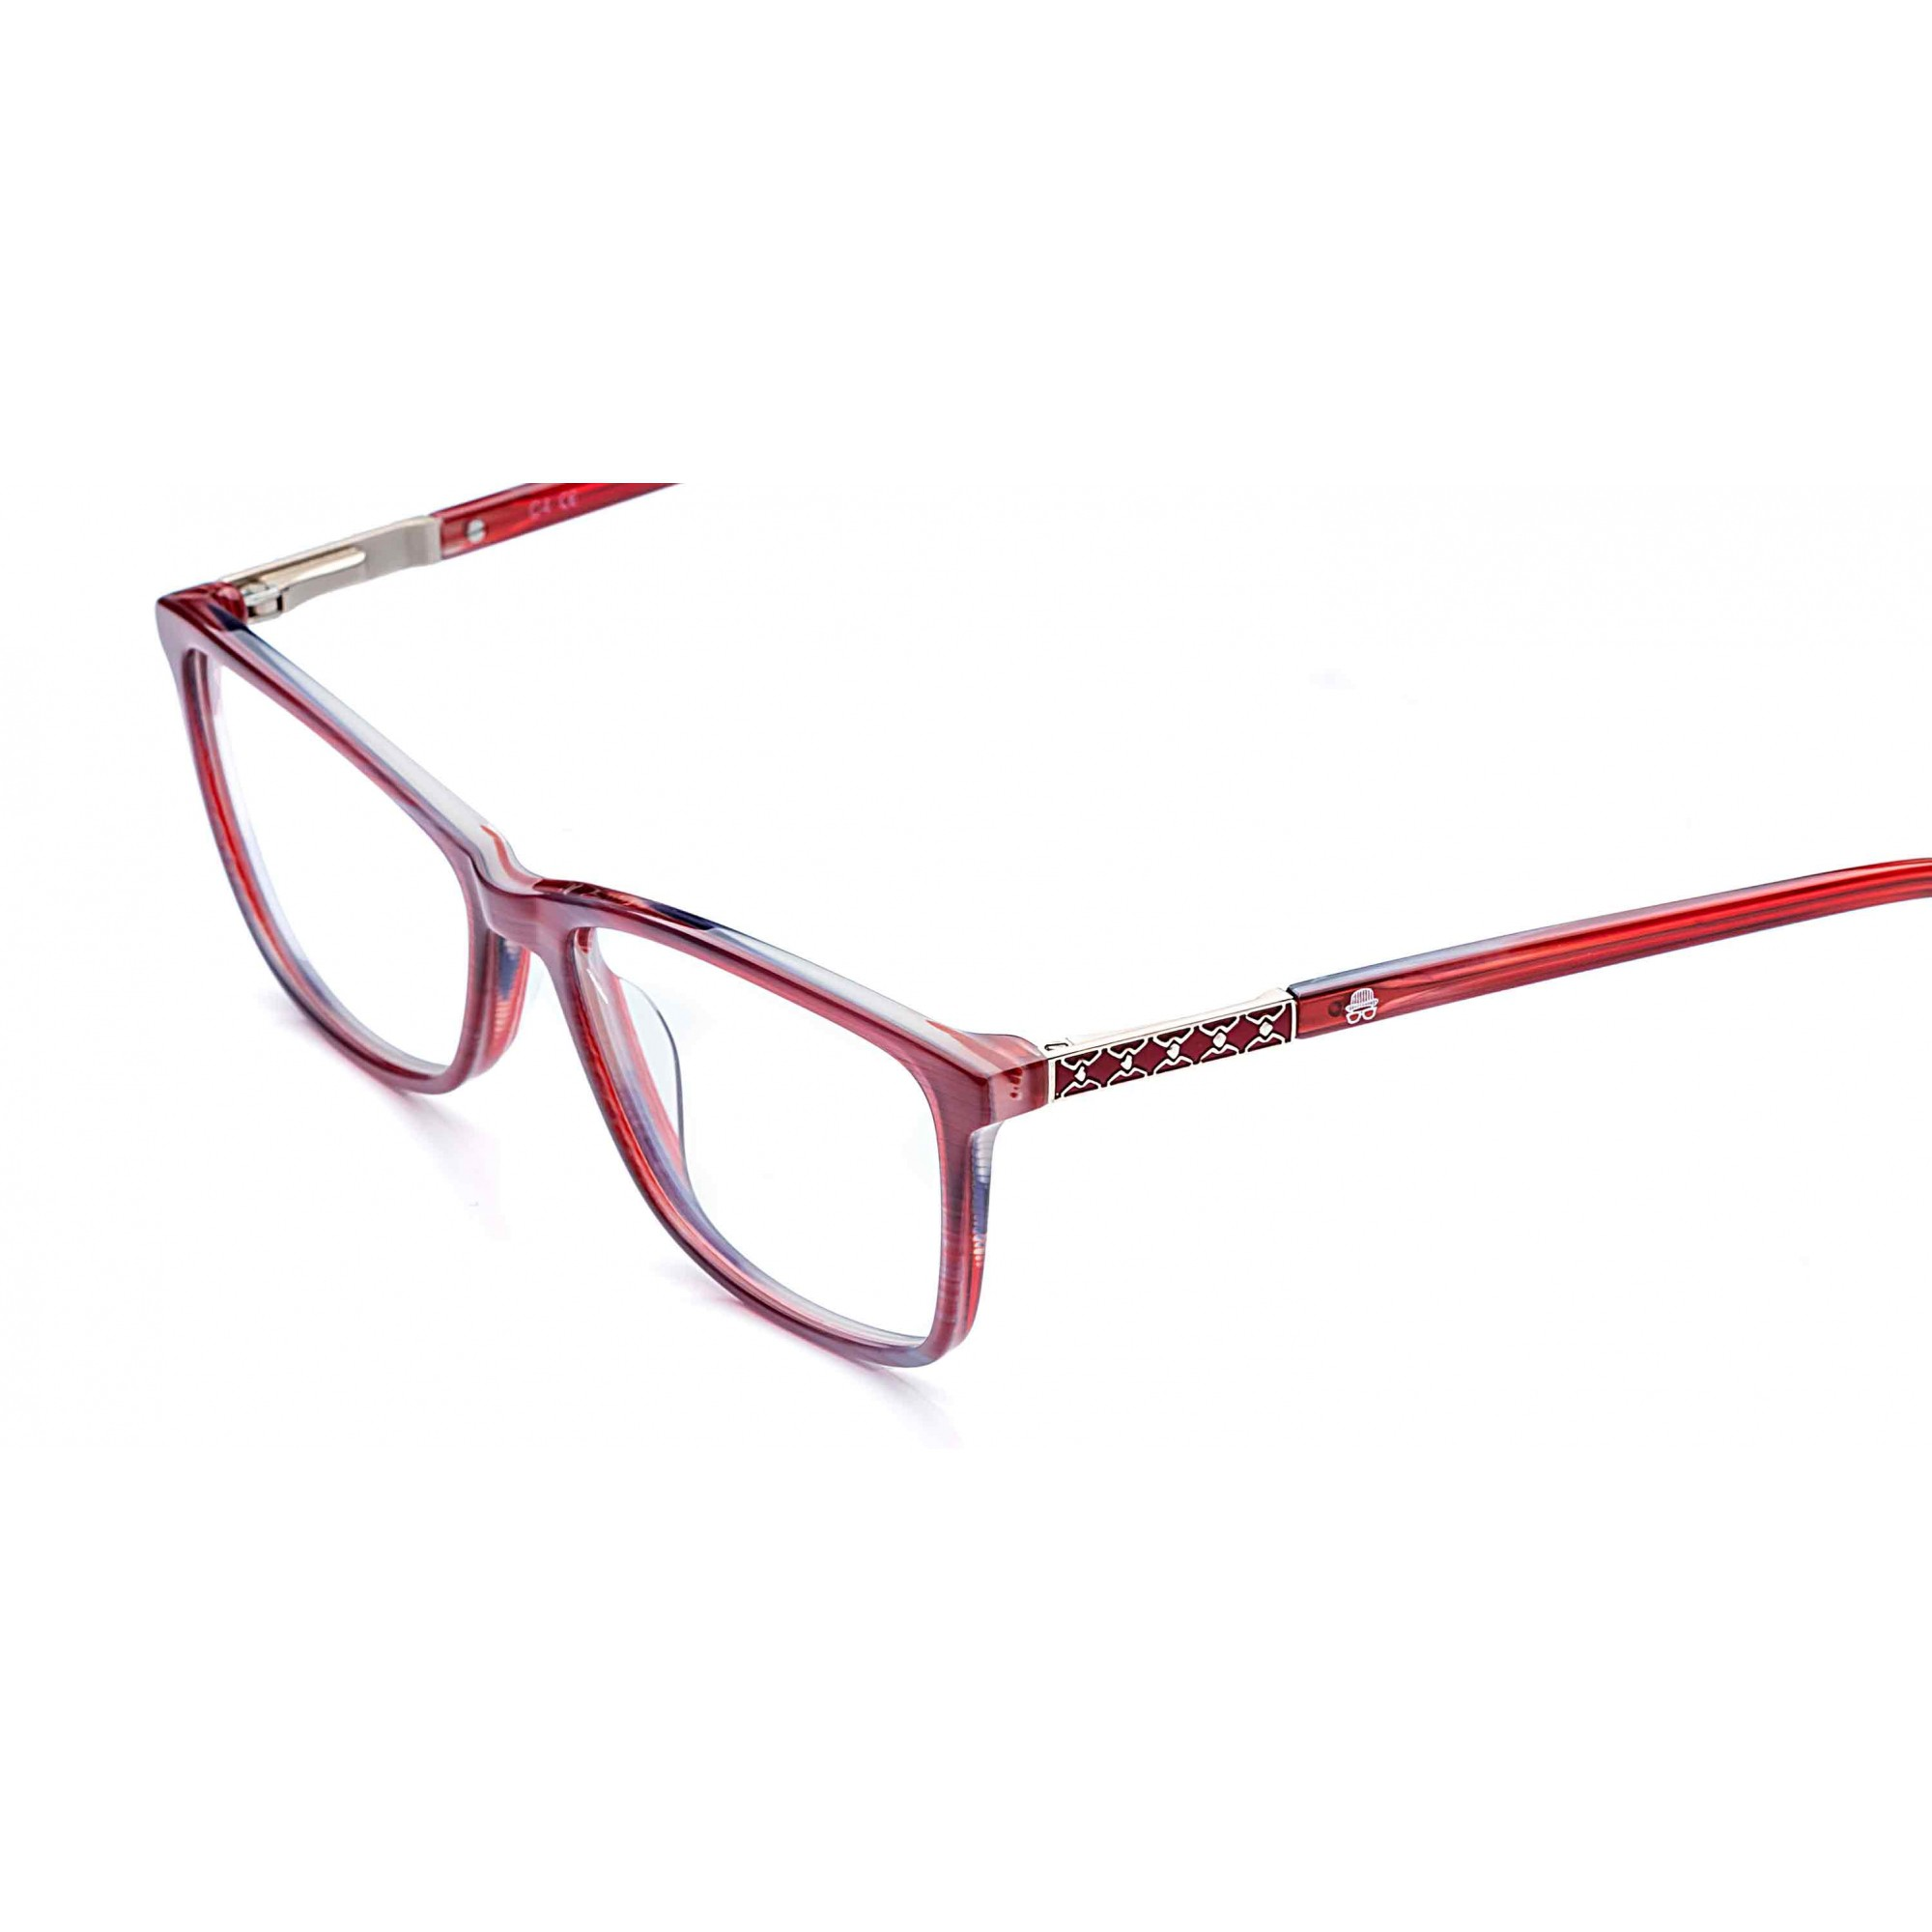 Óculos de Grau Shine Rafael Lopes Eyewear